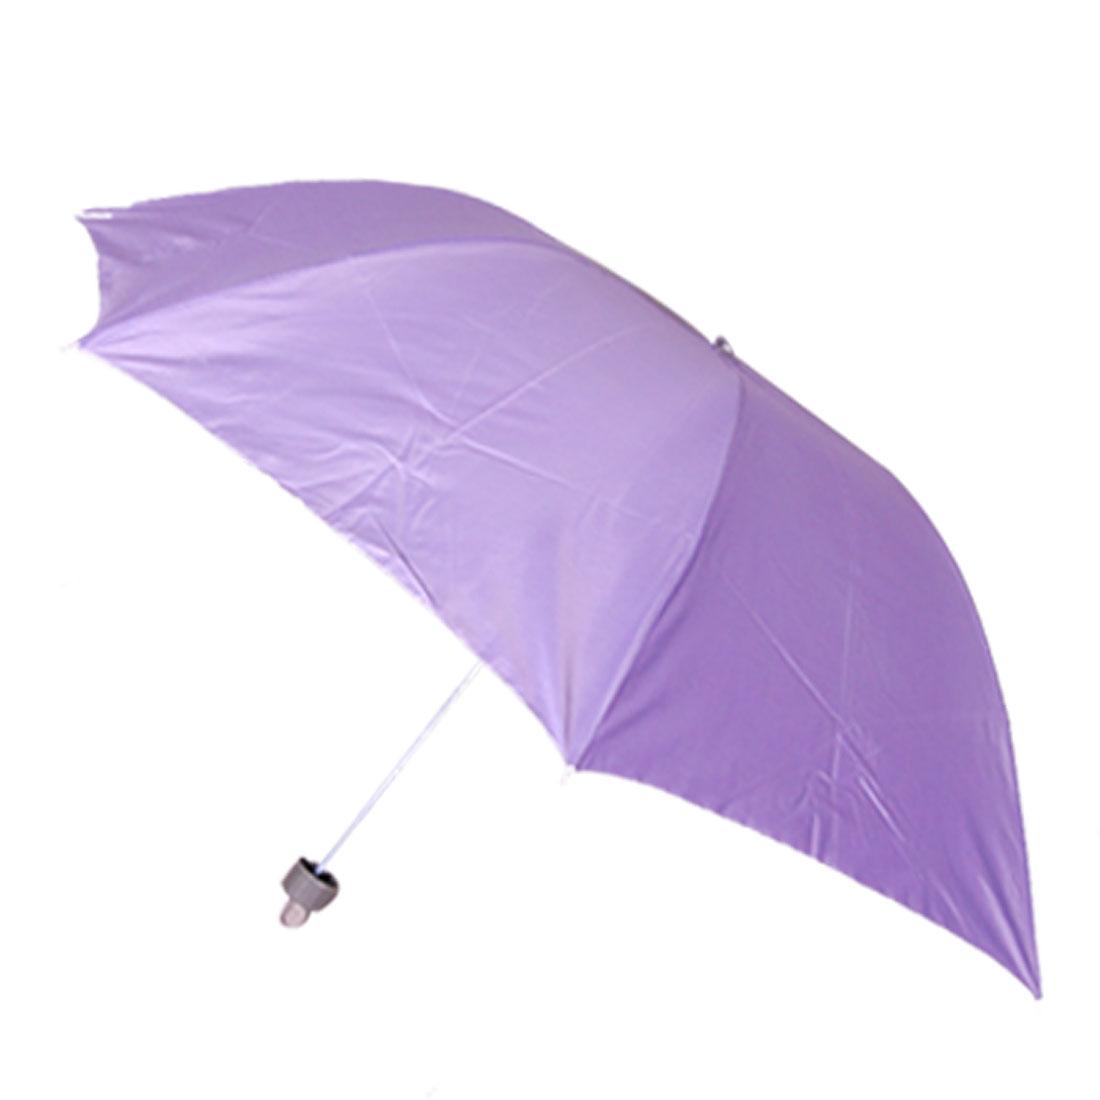 Plastic Handle 3 Sections Telescopic Tube Folding Purple Umbrella